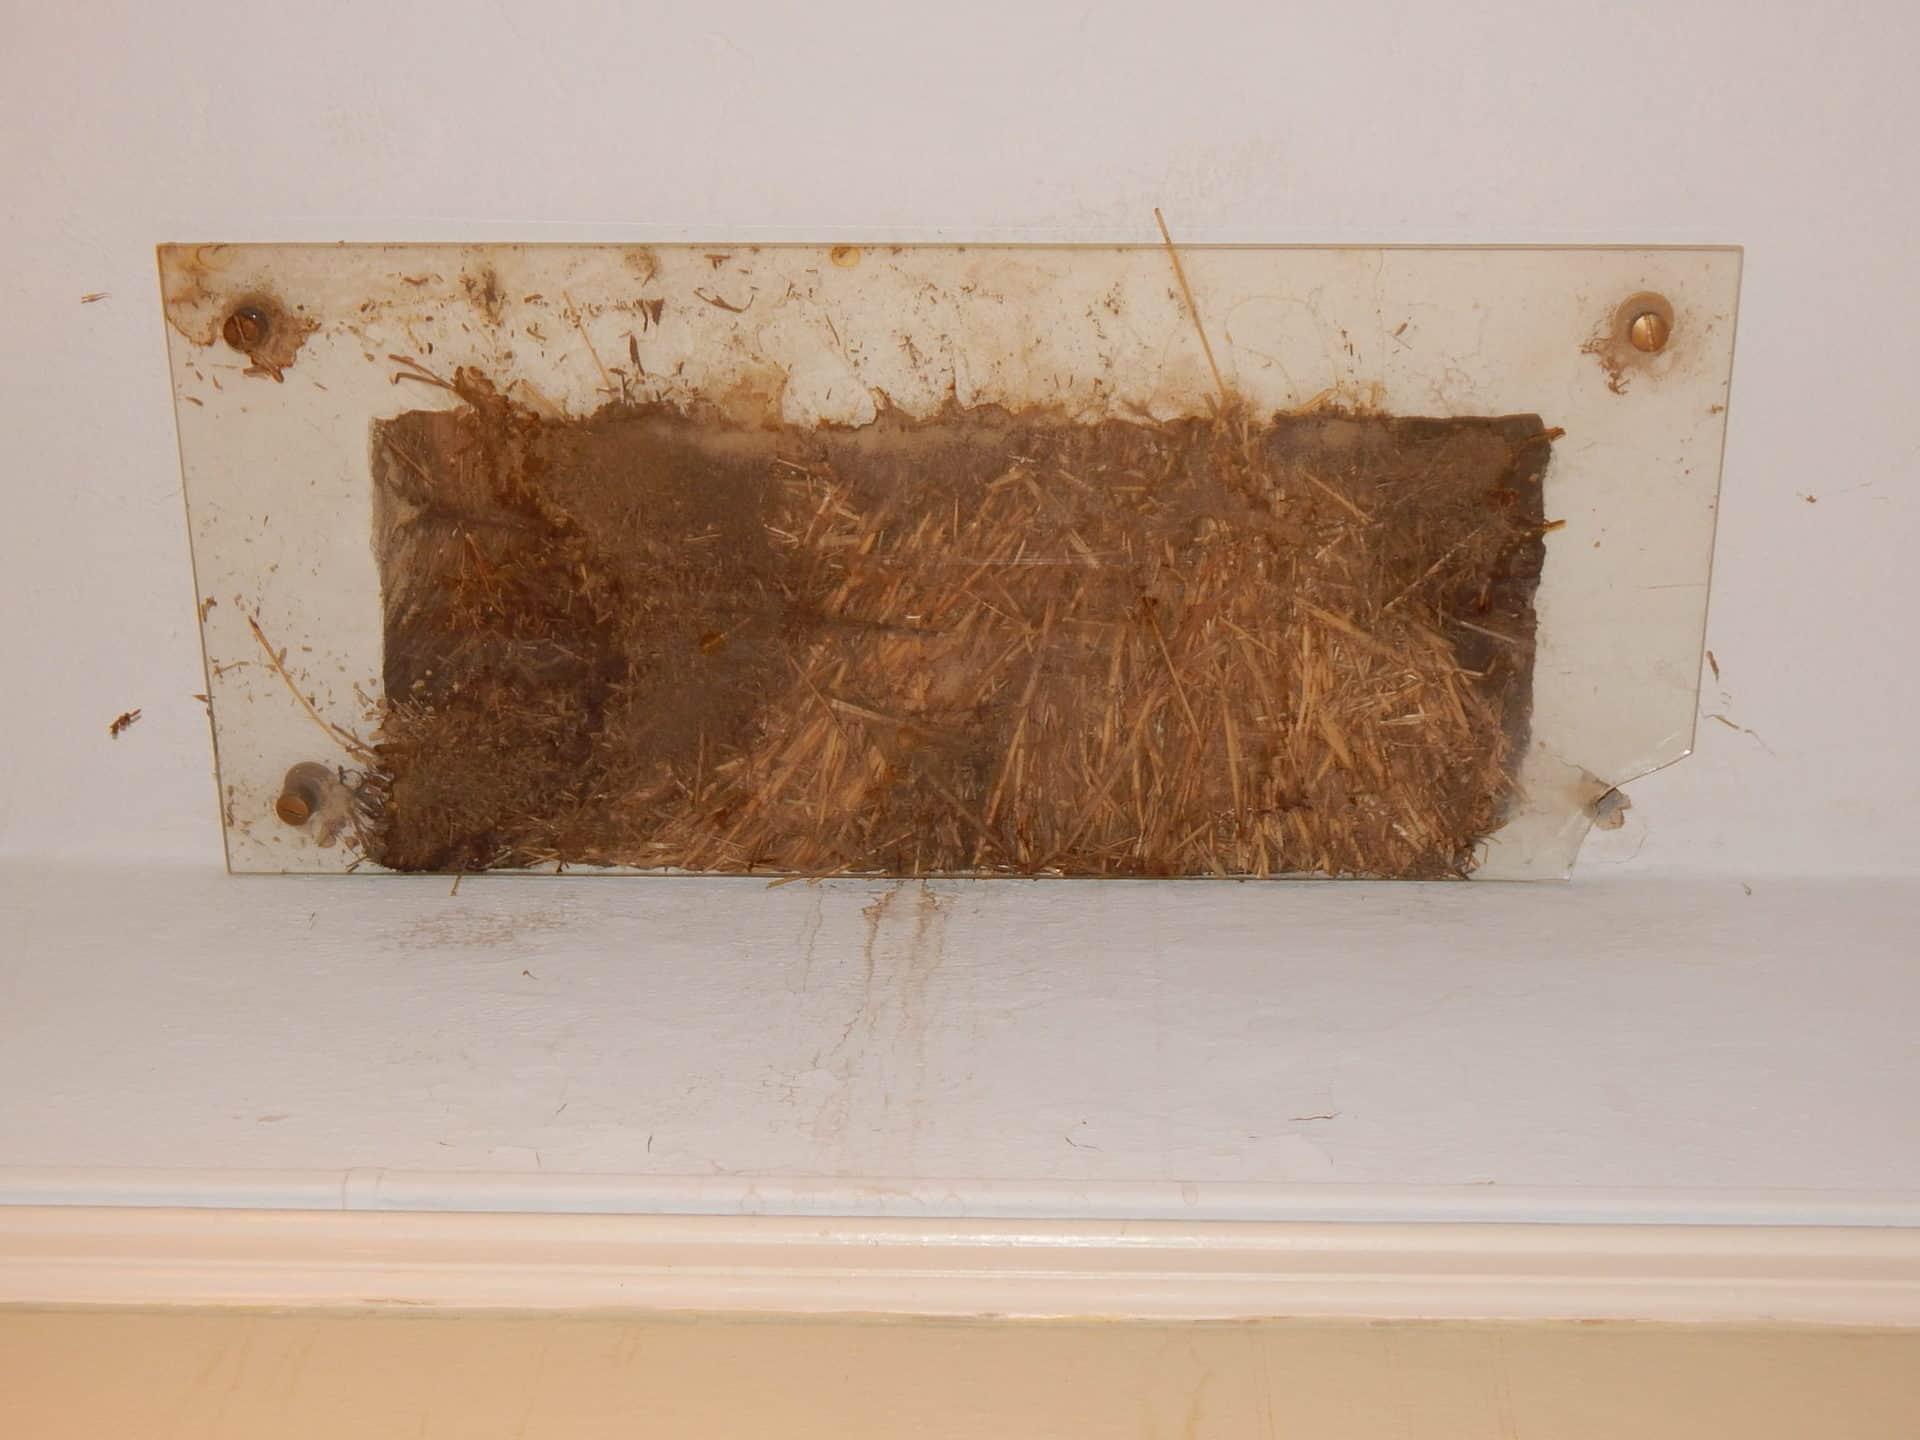 Burritt on the Mountain - Straw Insulation